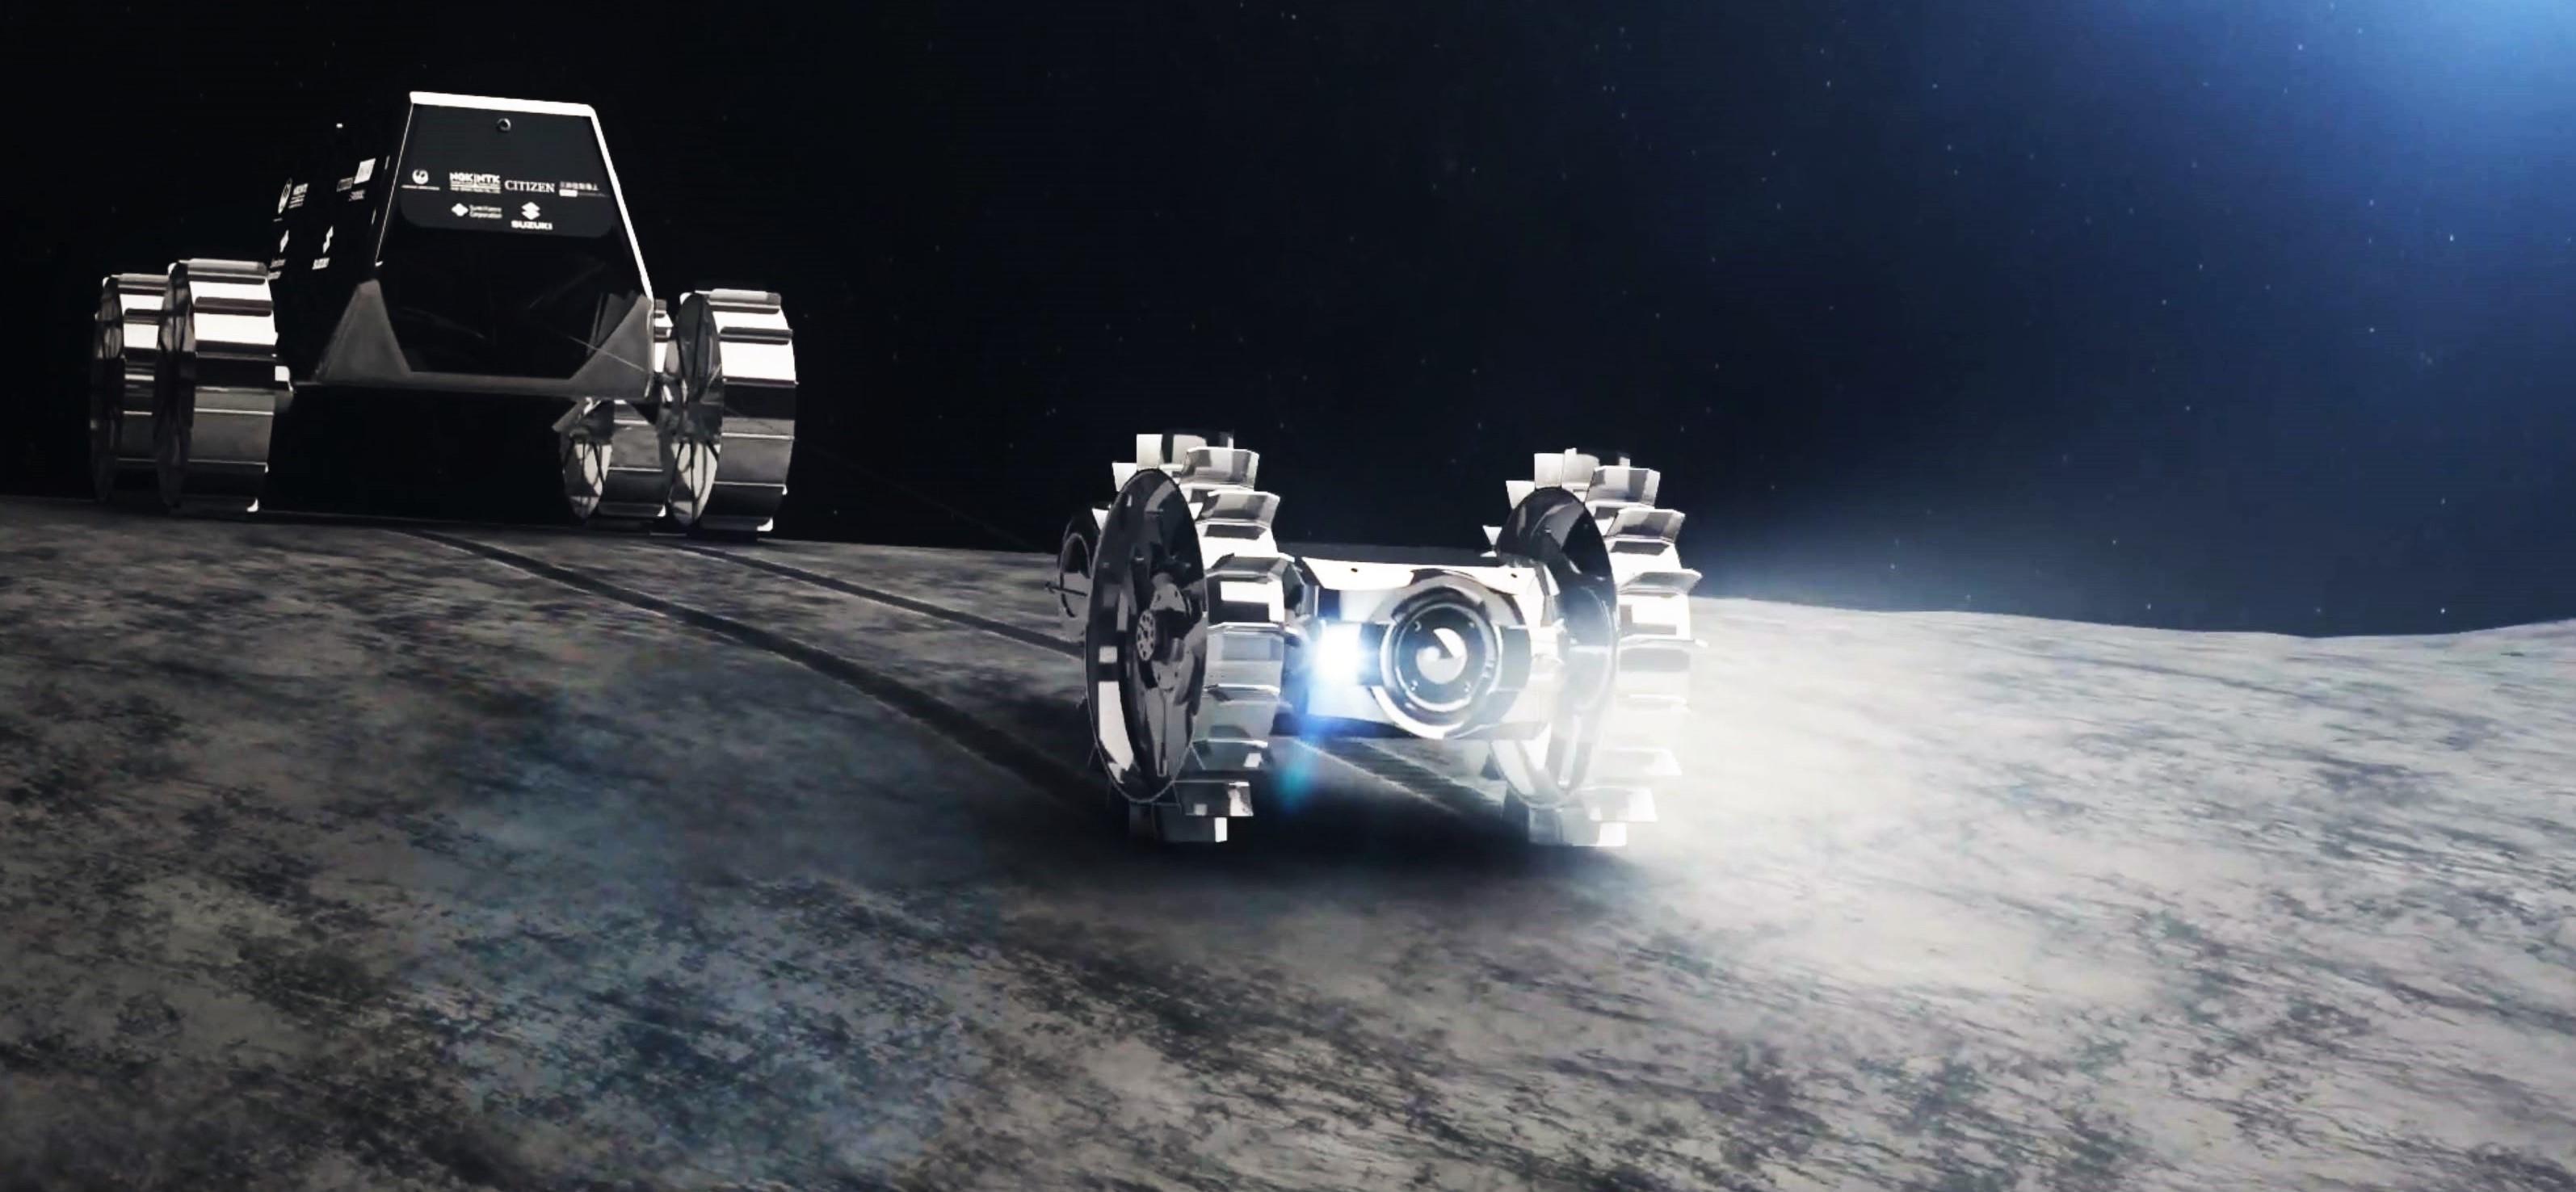 Hakuto-R Moon rover render (iSpace) 2